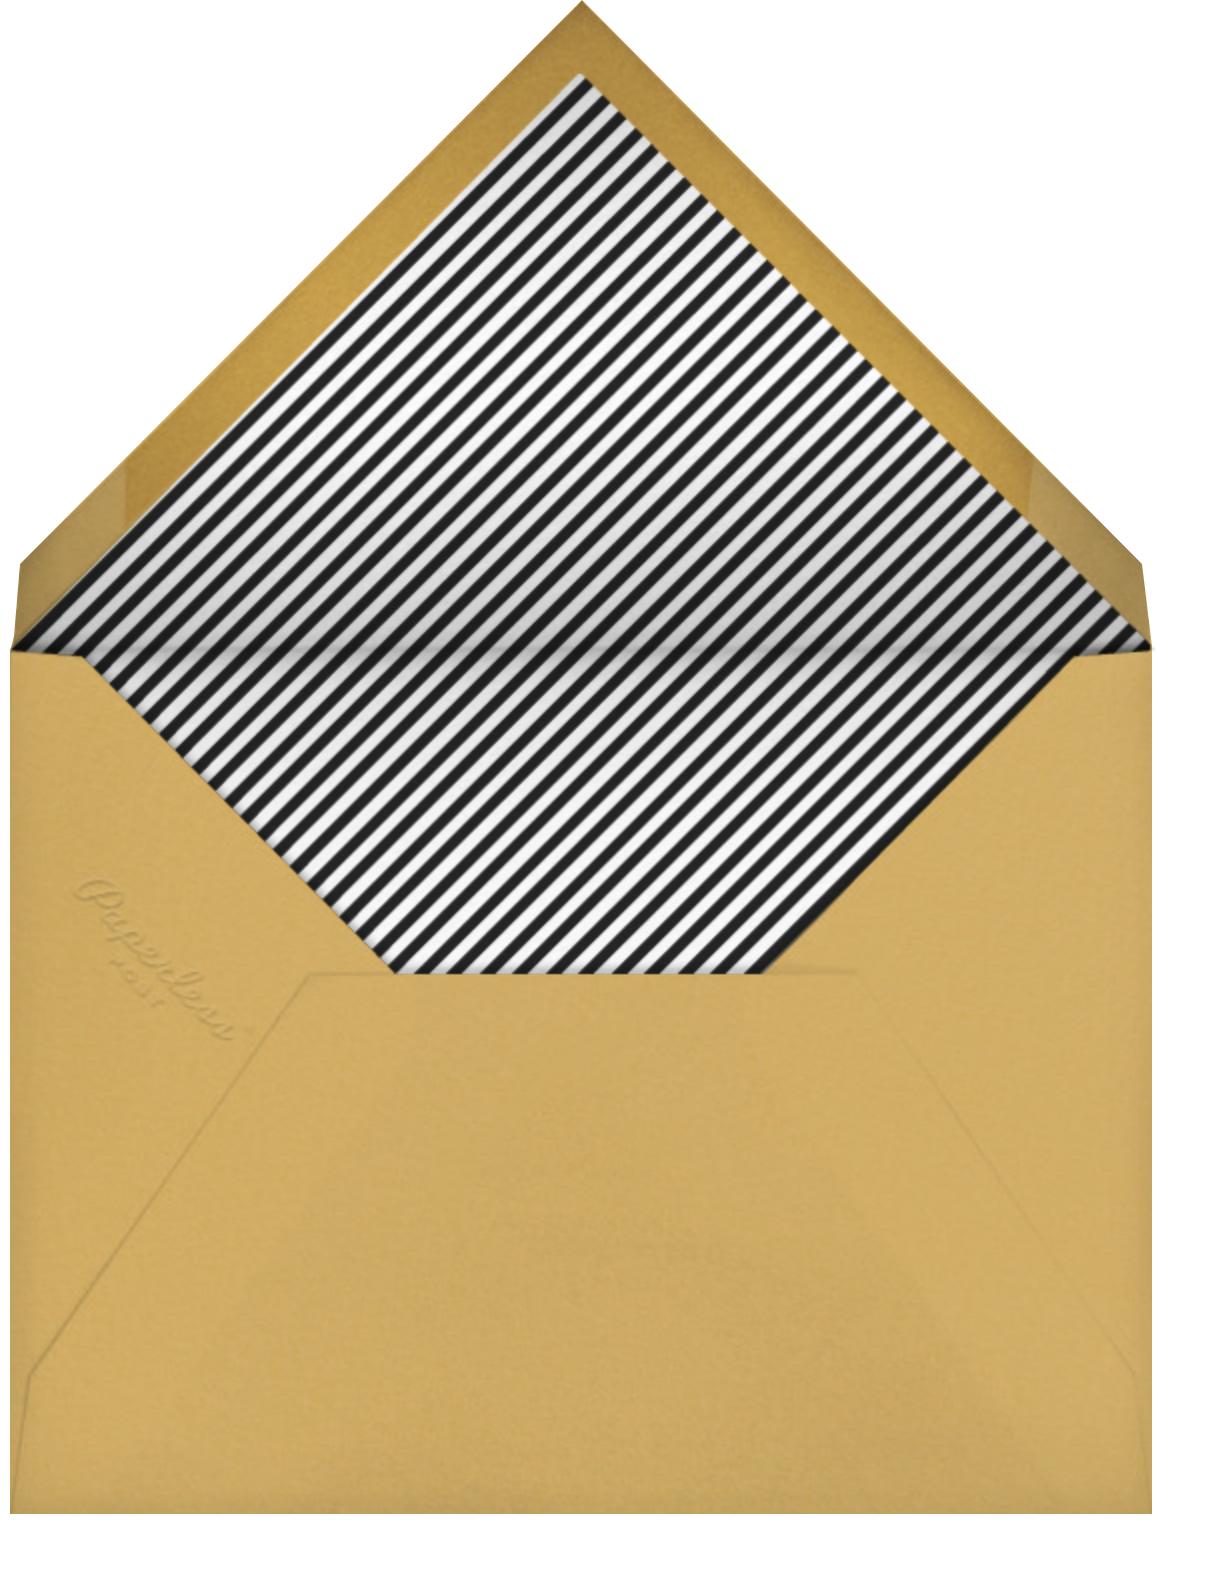 Sweden in the Summer - Sunshine - Mr. Boddington's Studio - Western party invitations - envelope back